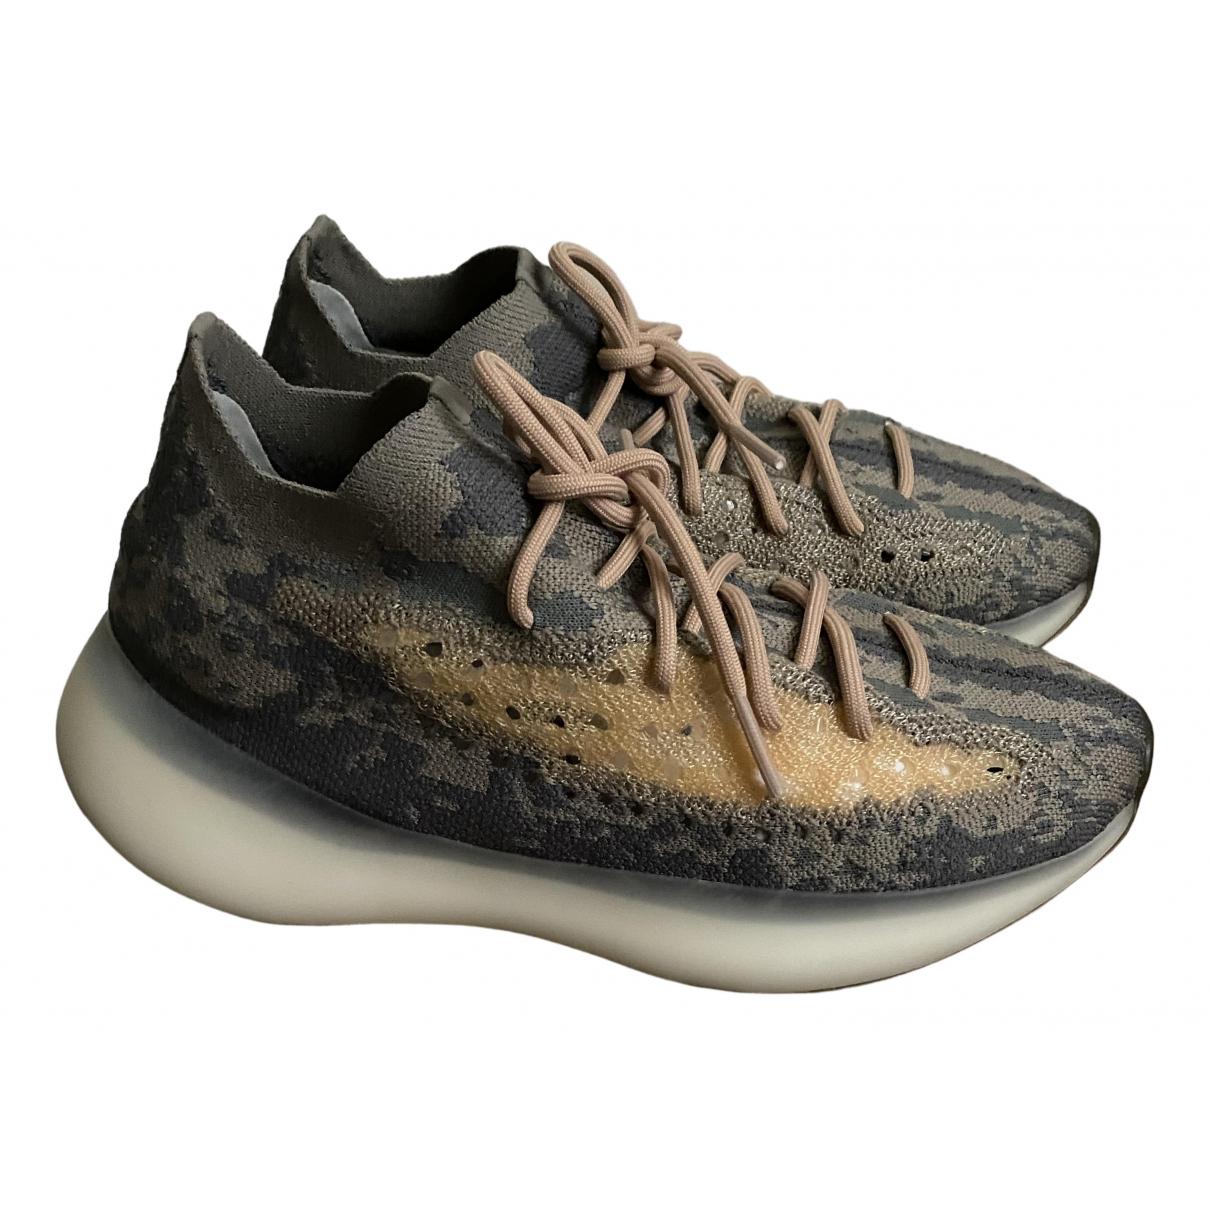 Yeezy X Adidas Boost 380 Sneakers in  Kamel Leinen